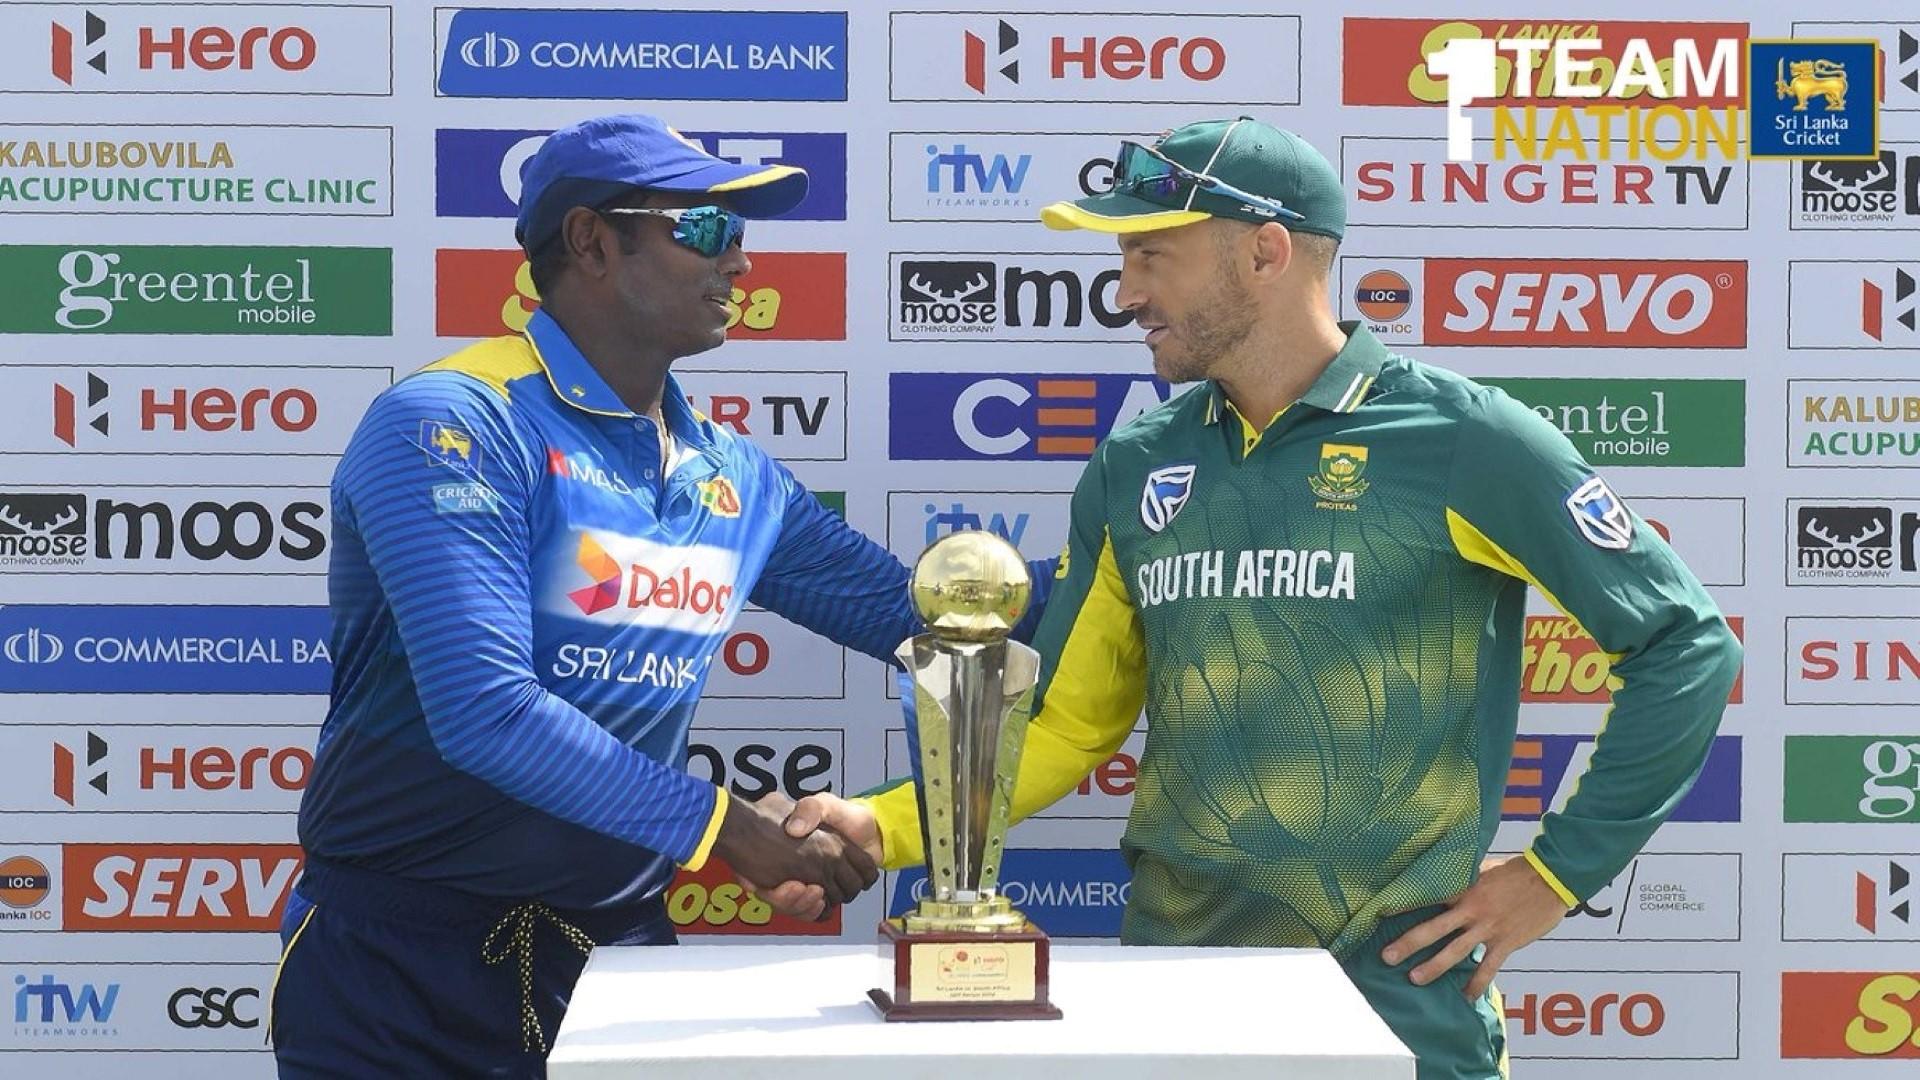 SL vs SA 2nd ODI live cricket streaming, highlights on Sony Six